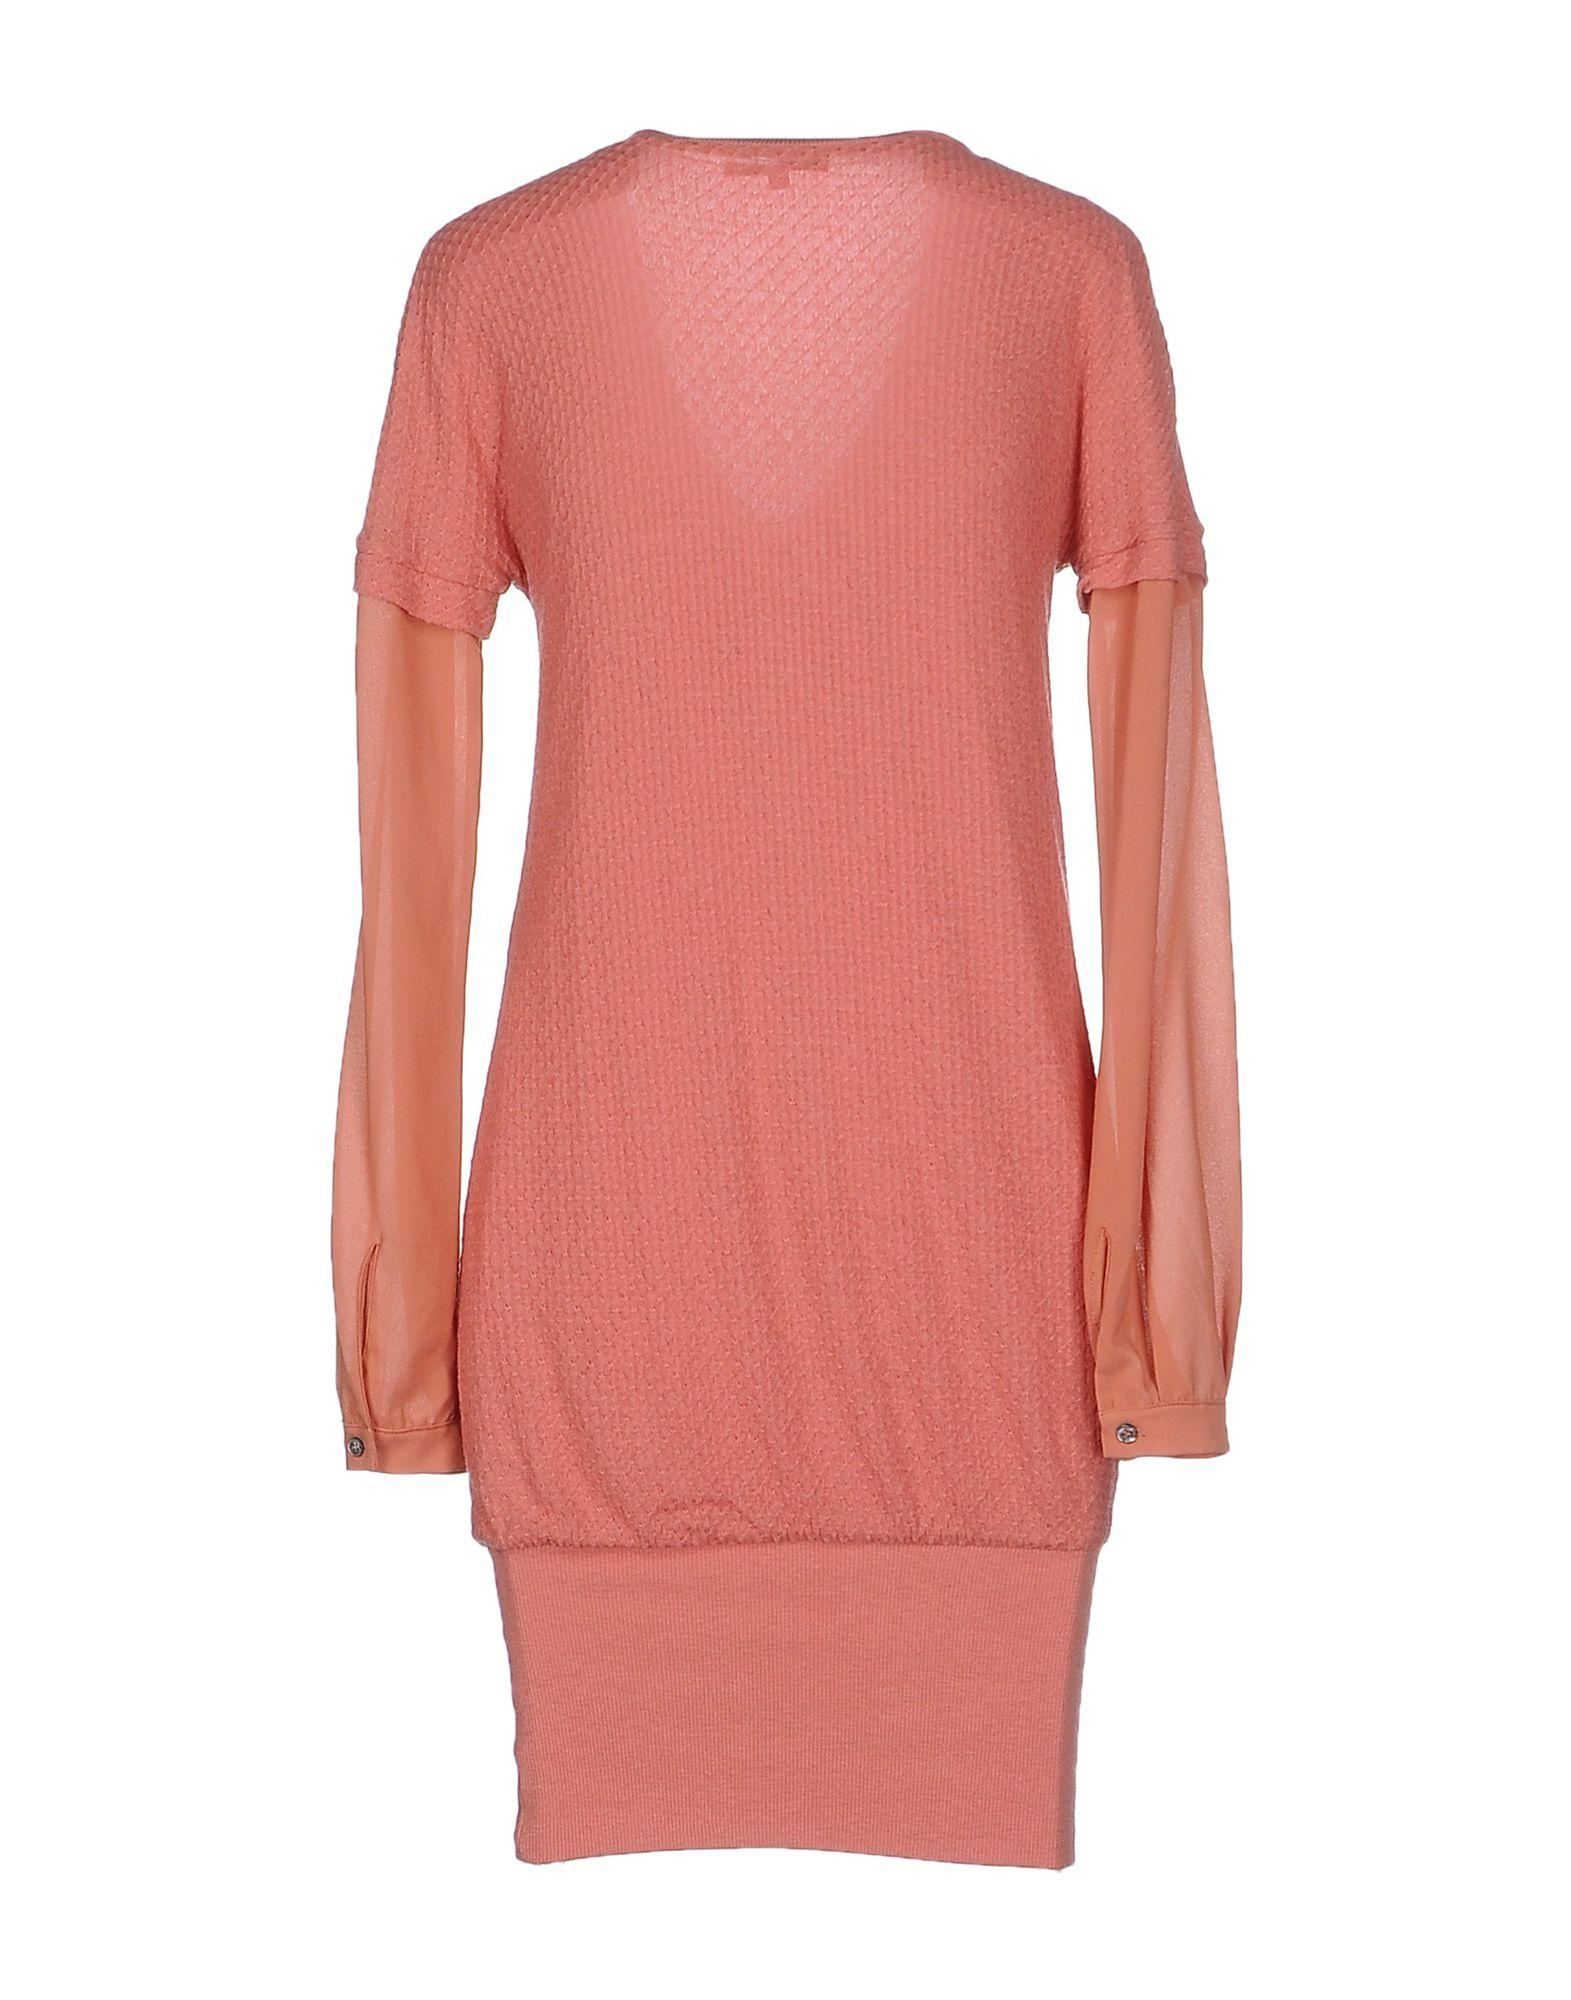 patrizia pepe short dress in pink lyst. Black Bedroom Furniture Sets. Home Design Ideas